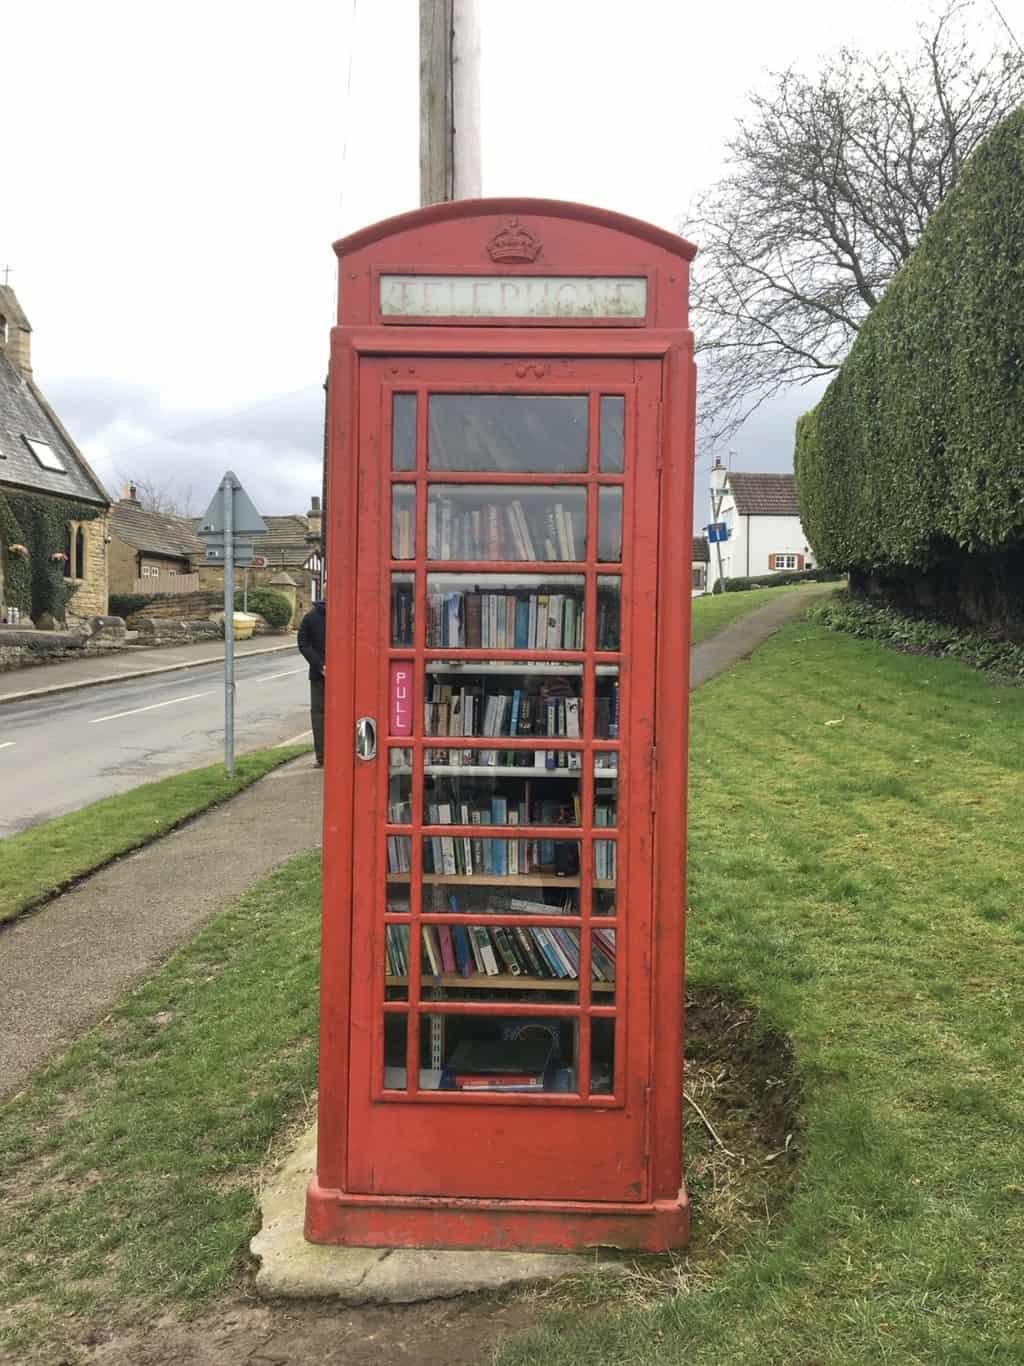 Linton Phone Box Library, North Yorkshire